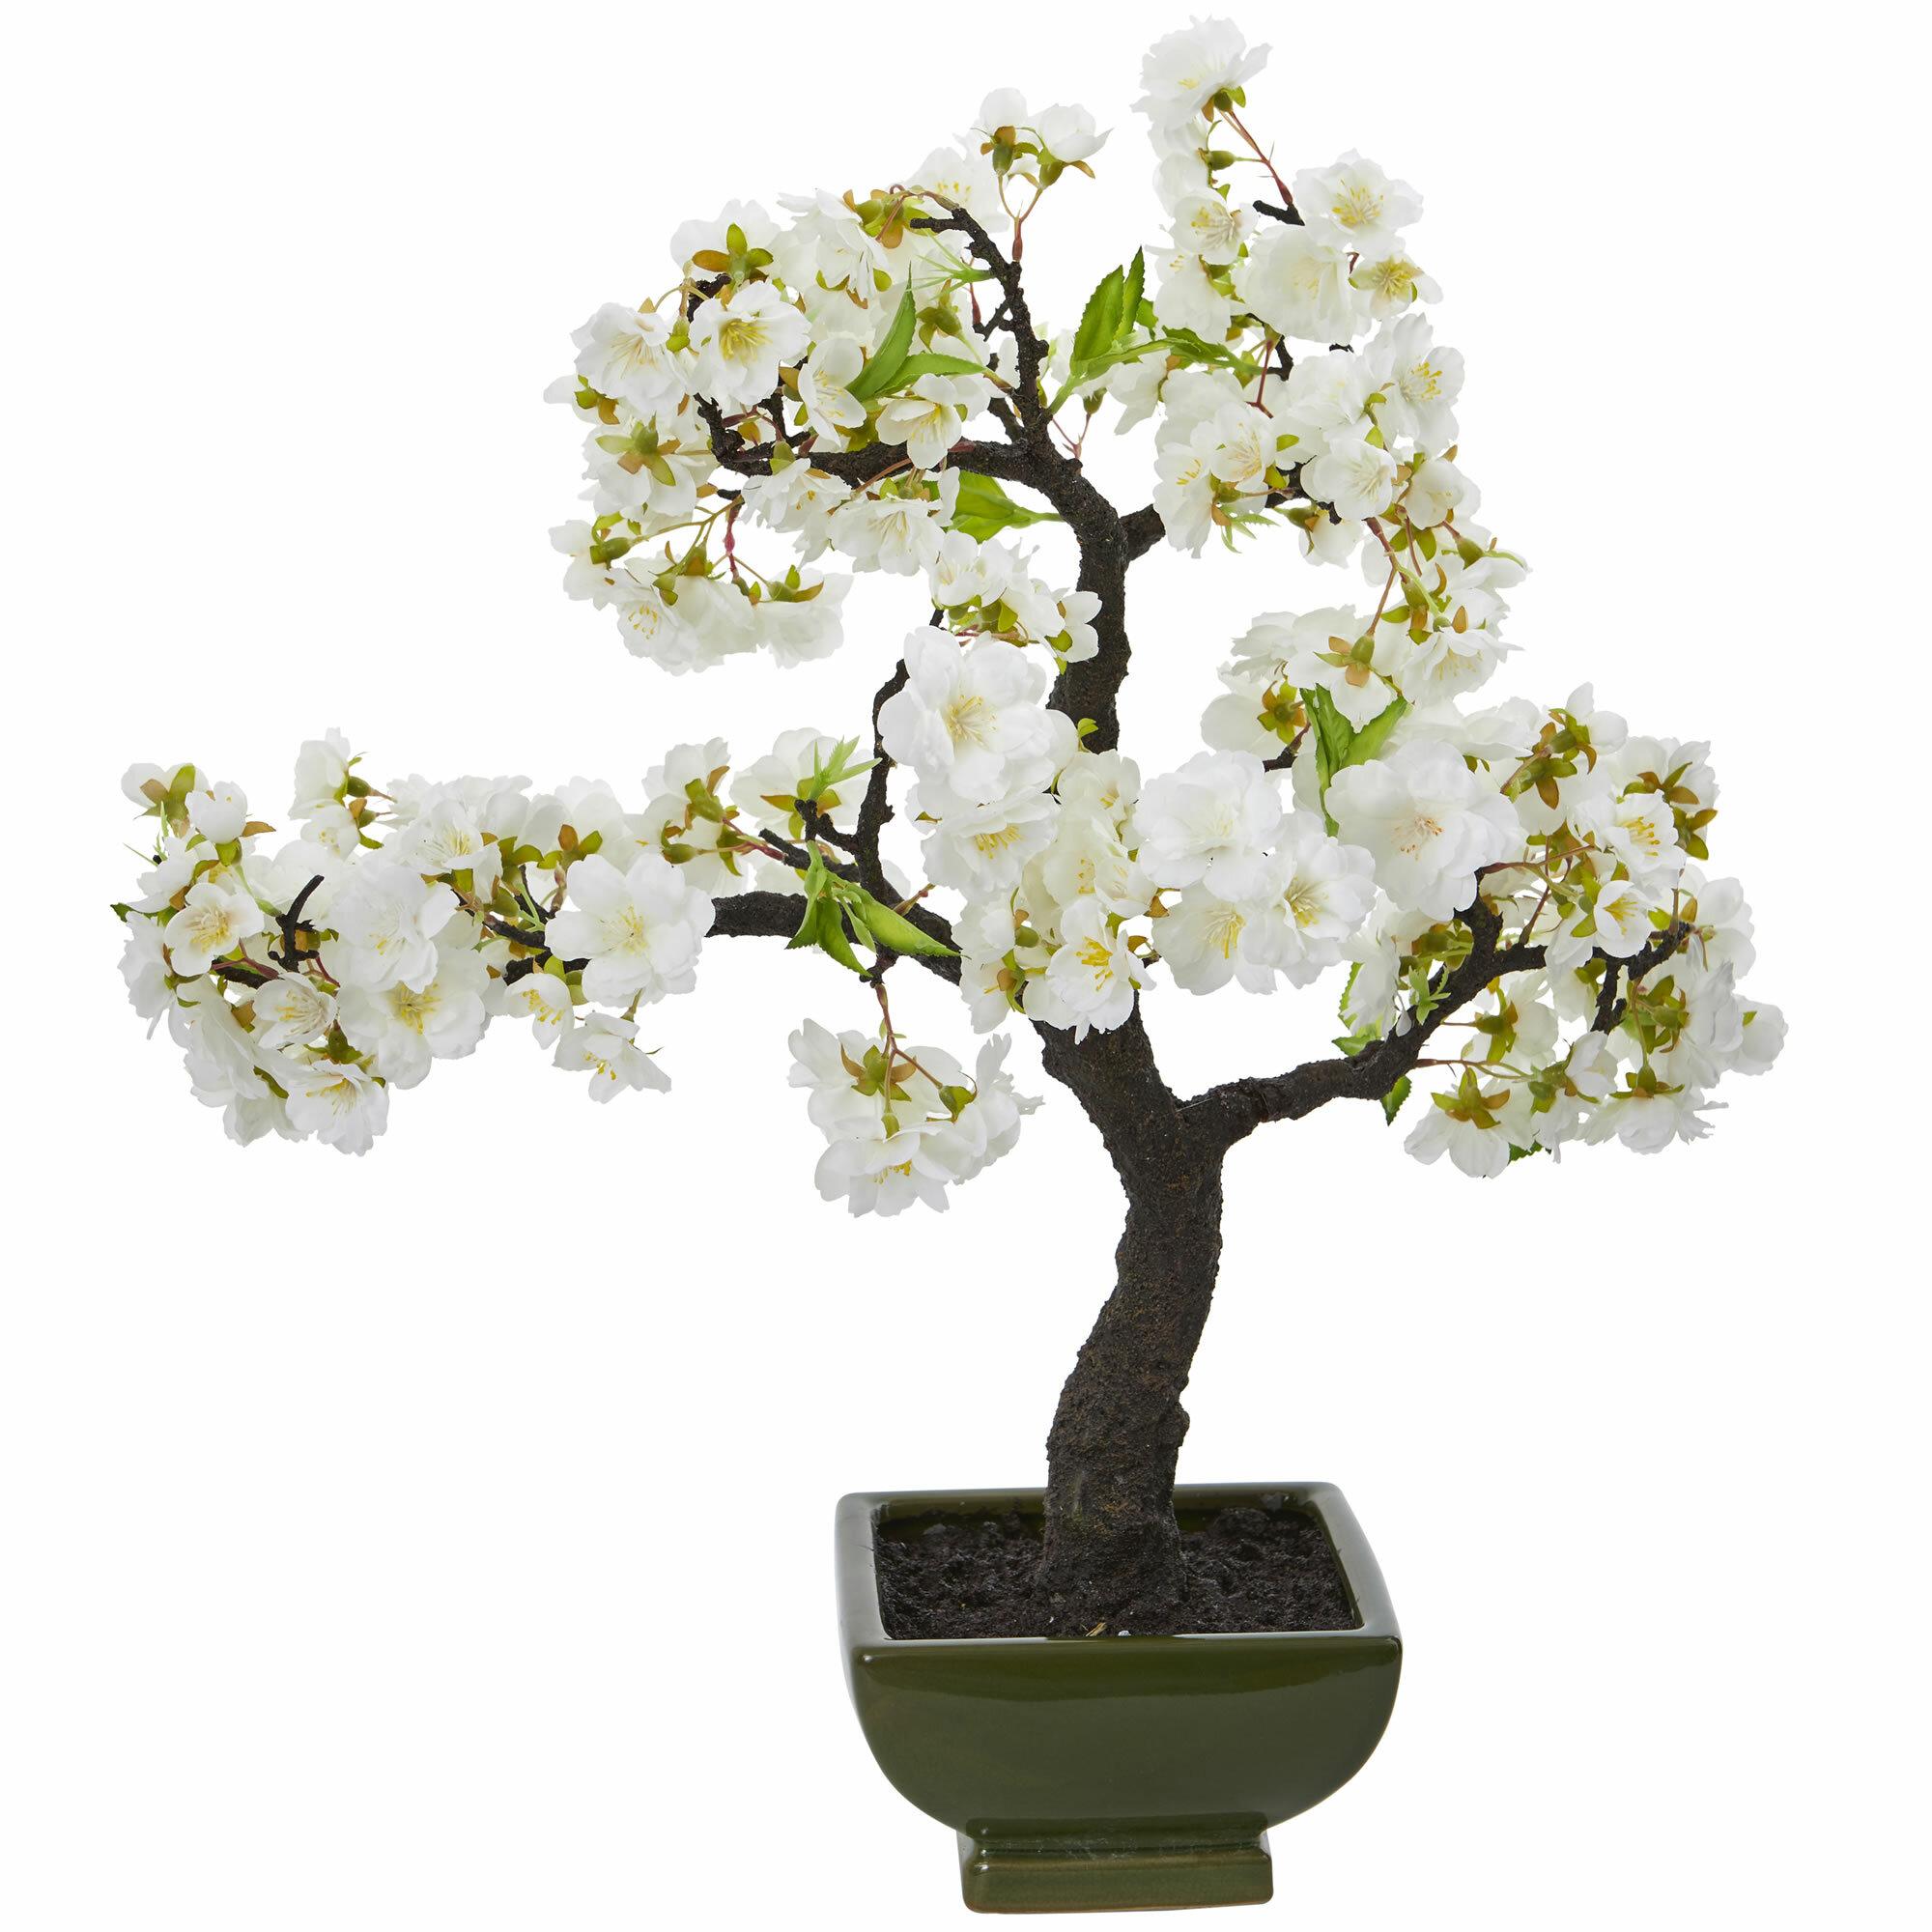 Bloomsbury Market Cherry Blossom Flowering Bonsai Tree Wayfair